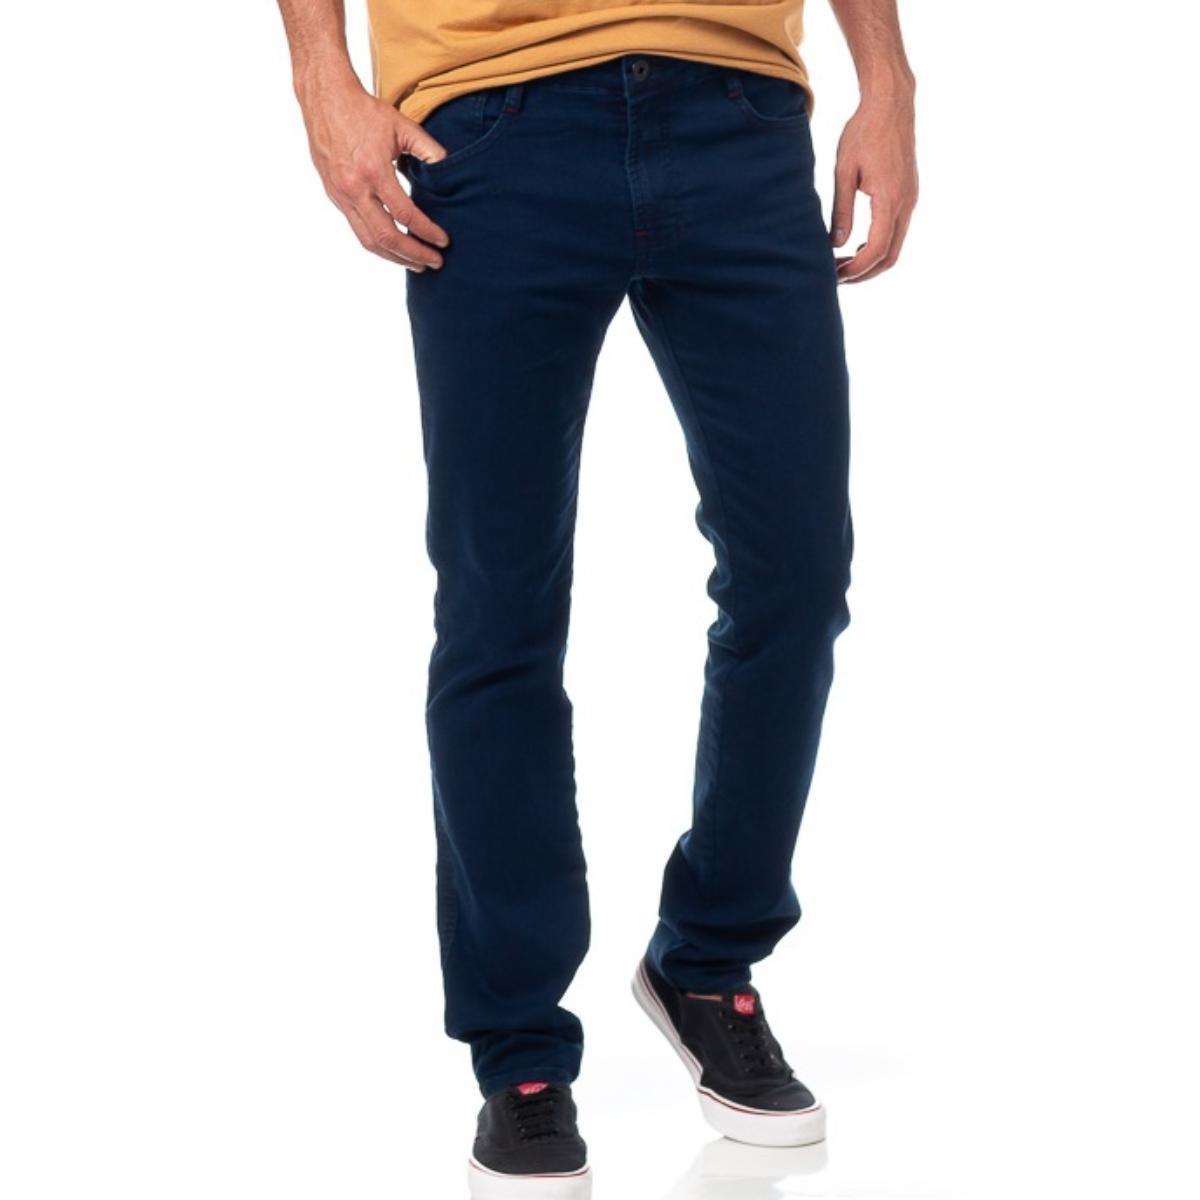 Calça Masculina Coca-cola Clothing 13202561 600 Jeans